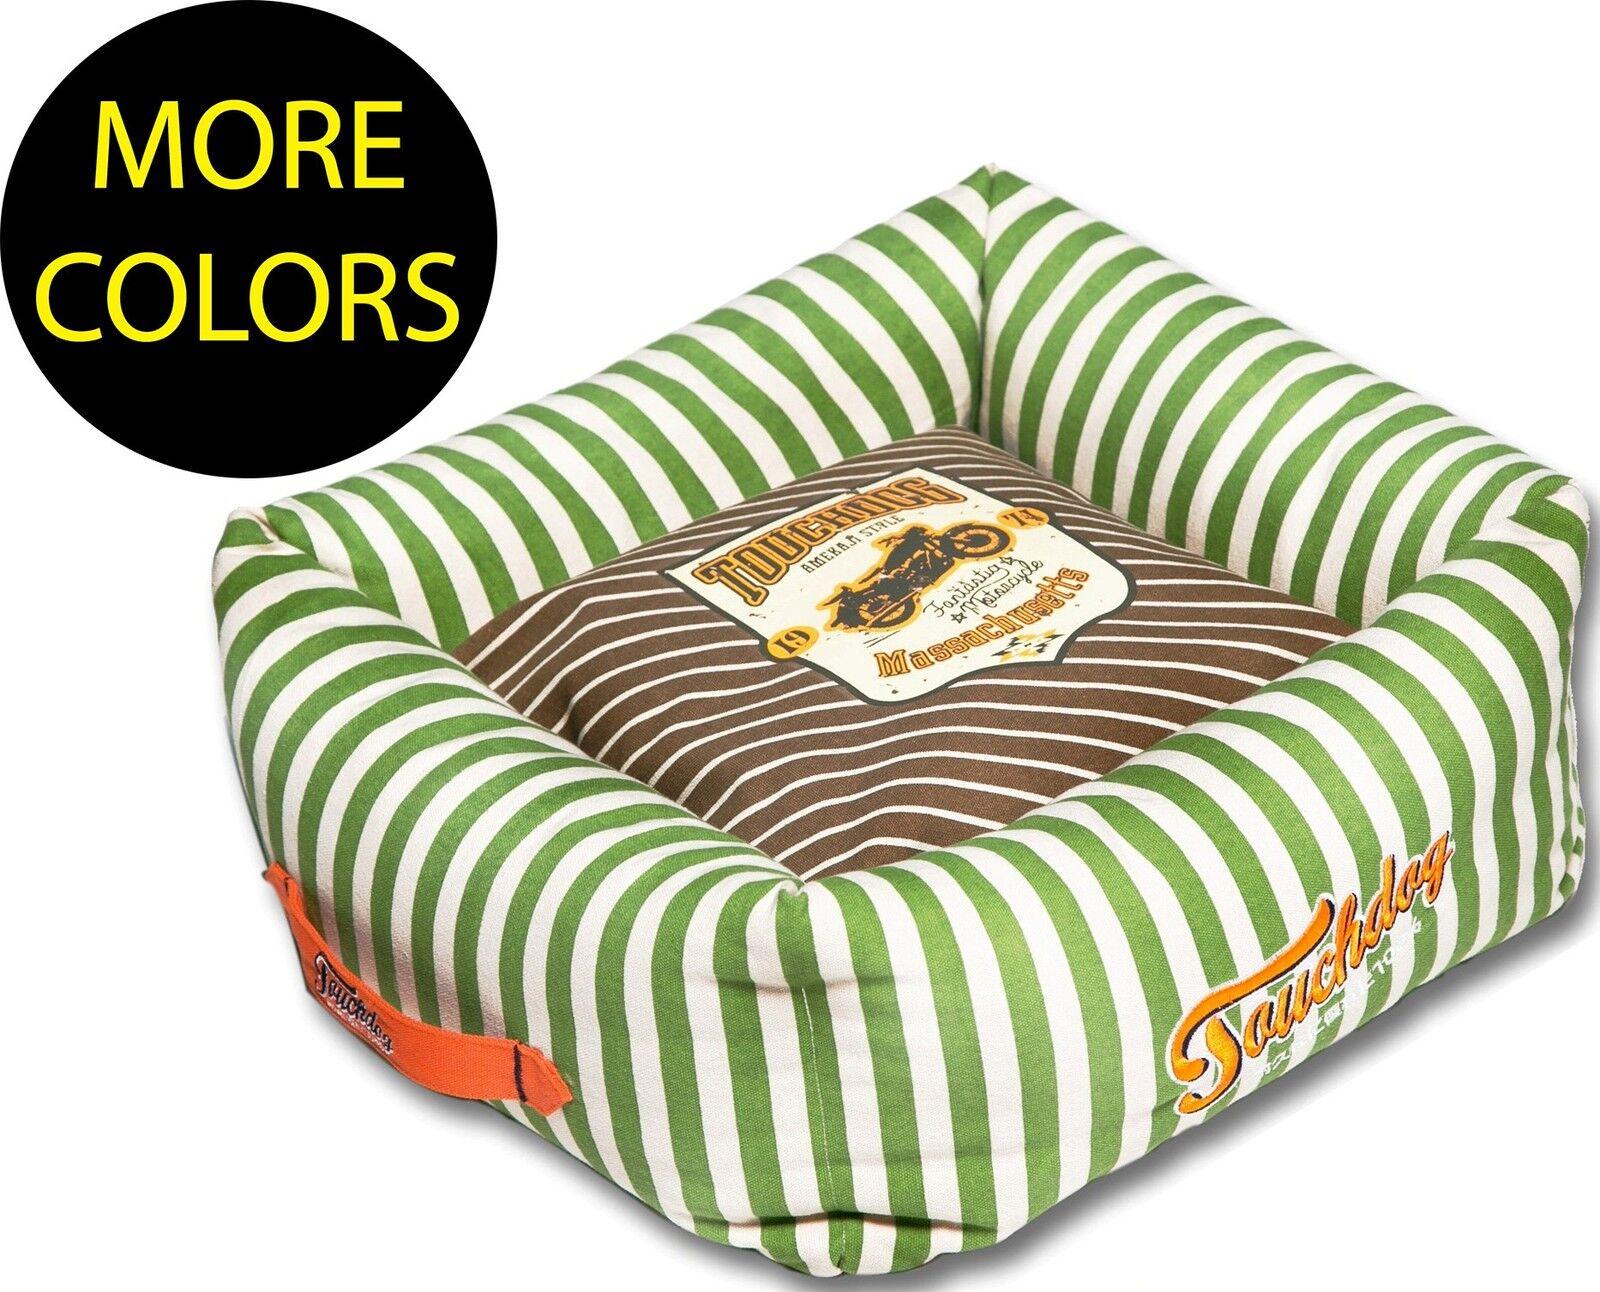 Neutral-Striped Ultra-Plush Easy Wash Squared Designer Fashion Pet Dog Bed Beds